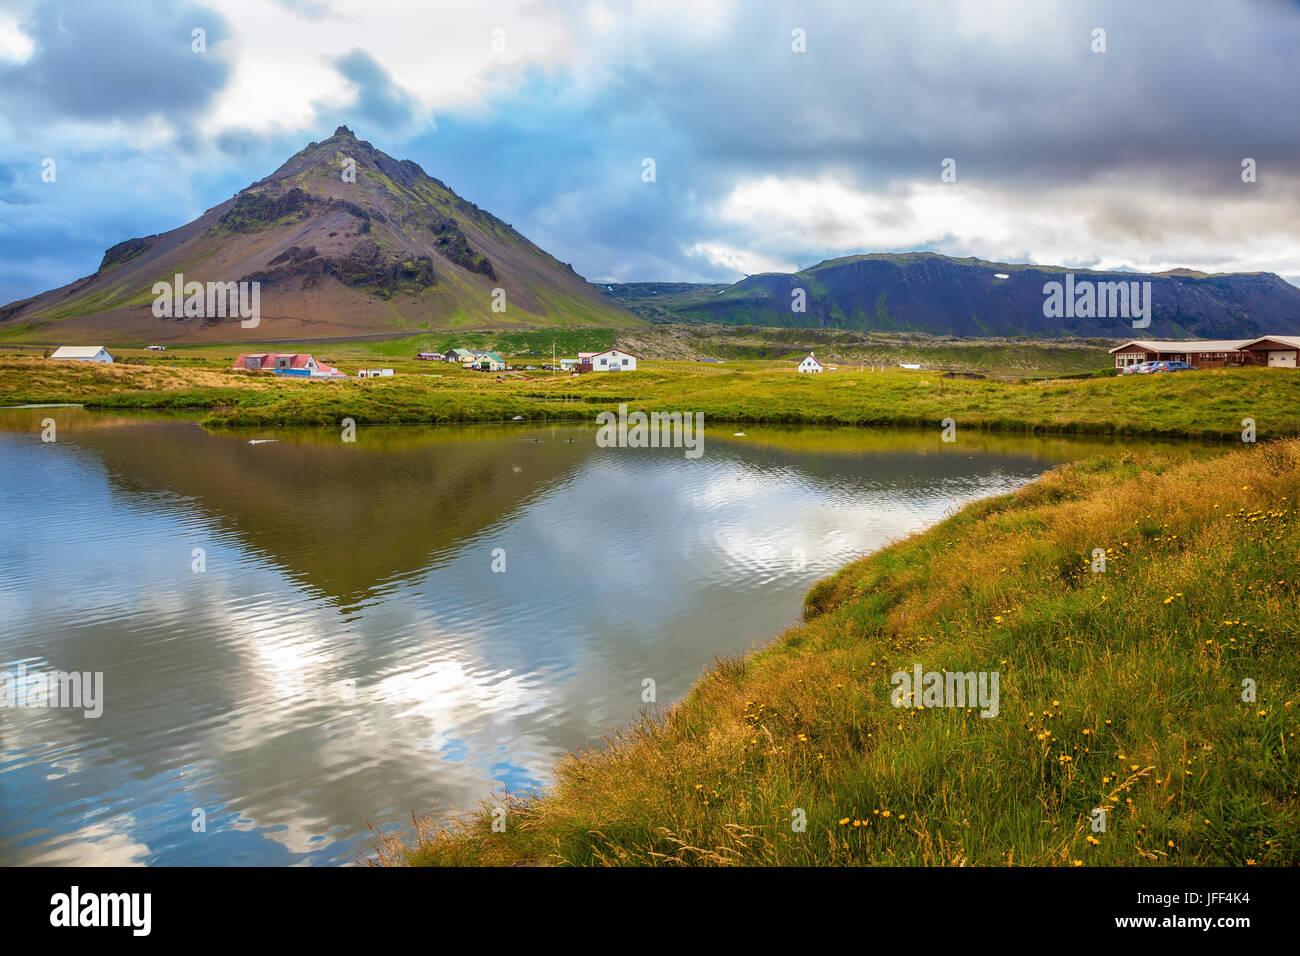 Evening light in the Polar region - Stock Image